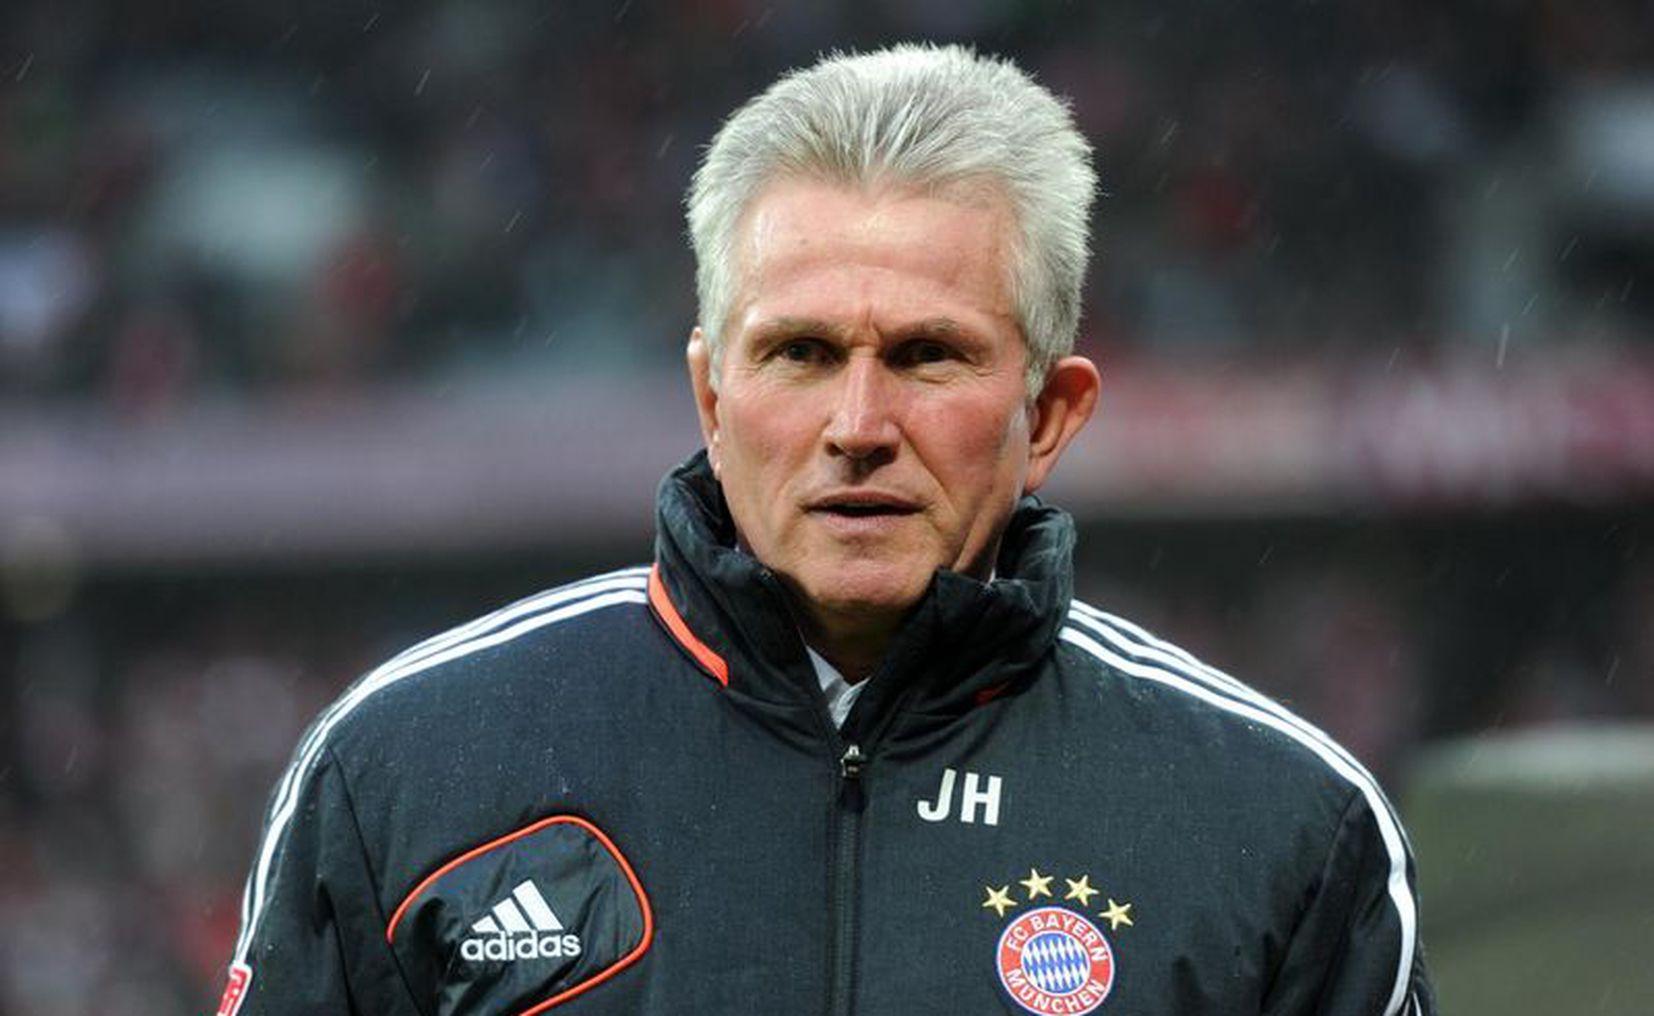 Deportes   Por cuarta vez, Jupp Heynckes regresa al Bayern Múnich